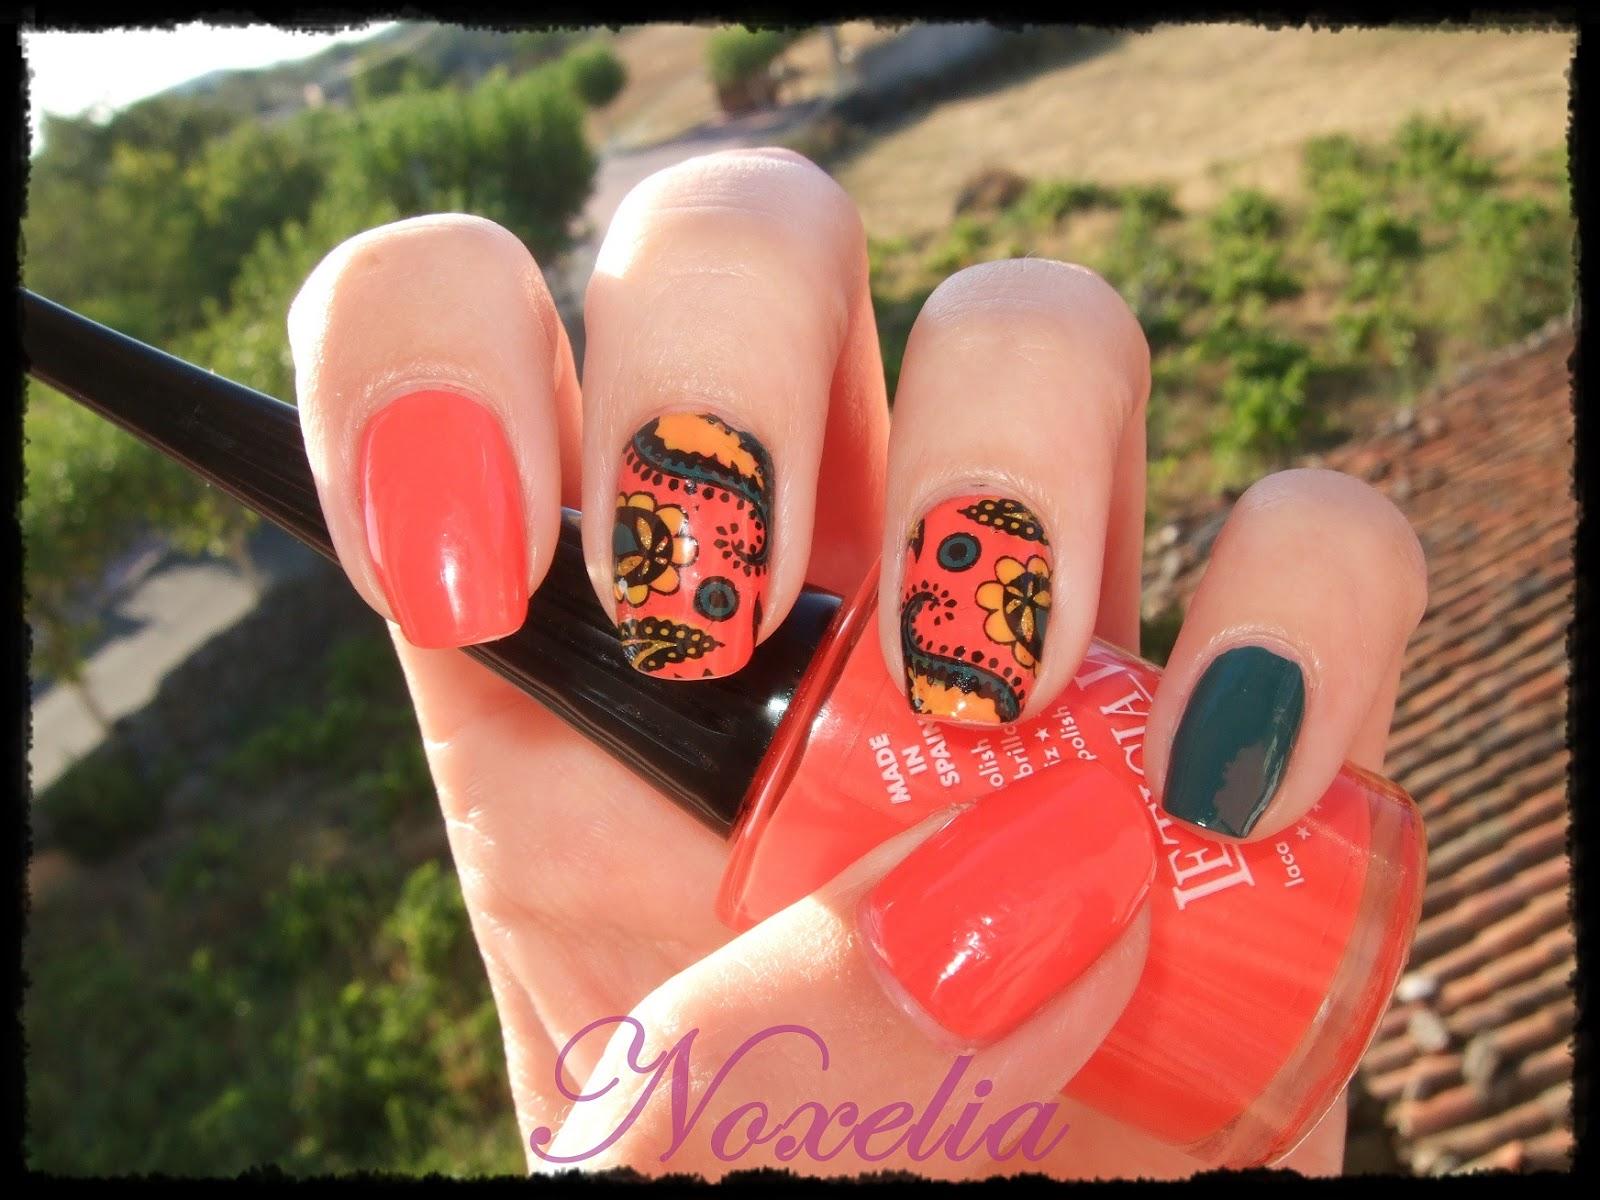 Noxelia: Stamping nail art: Look de uñas Nº 264. Reto Colores Naranja